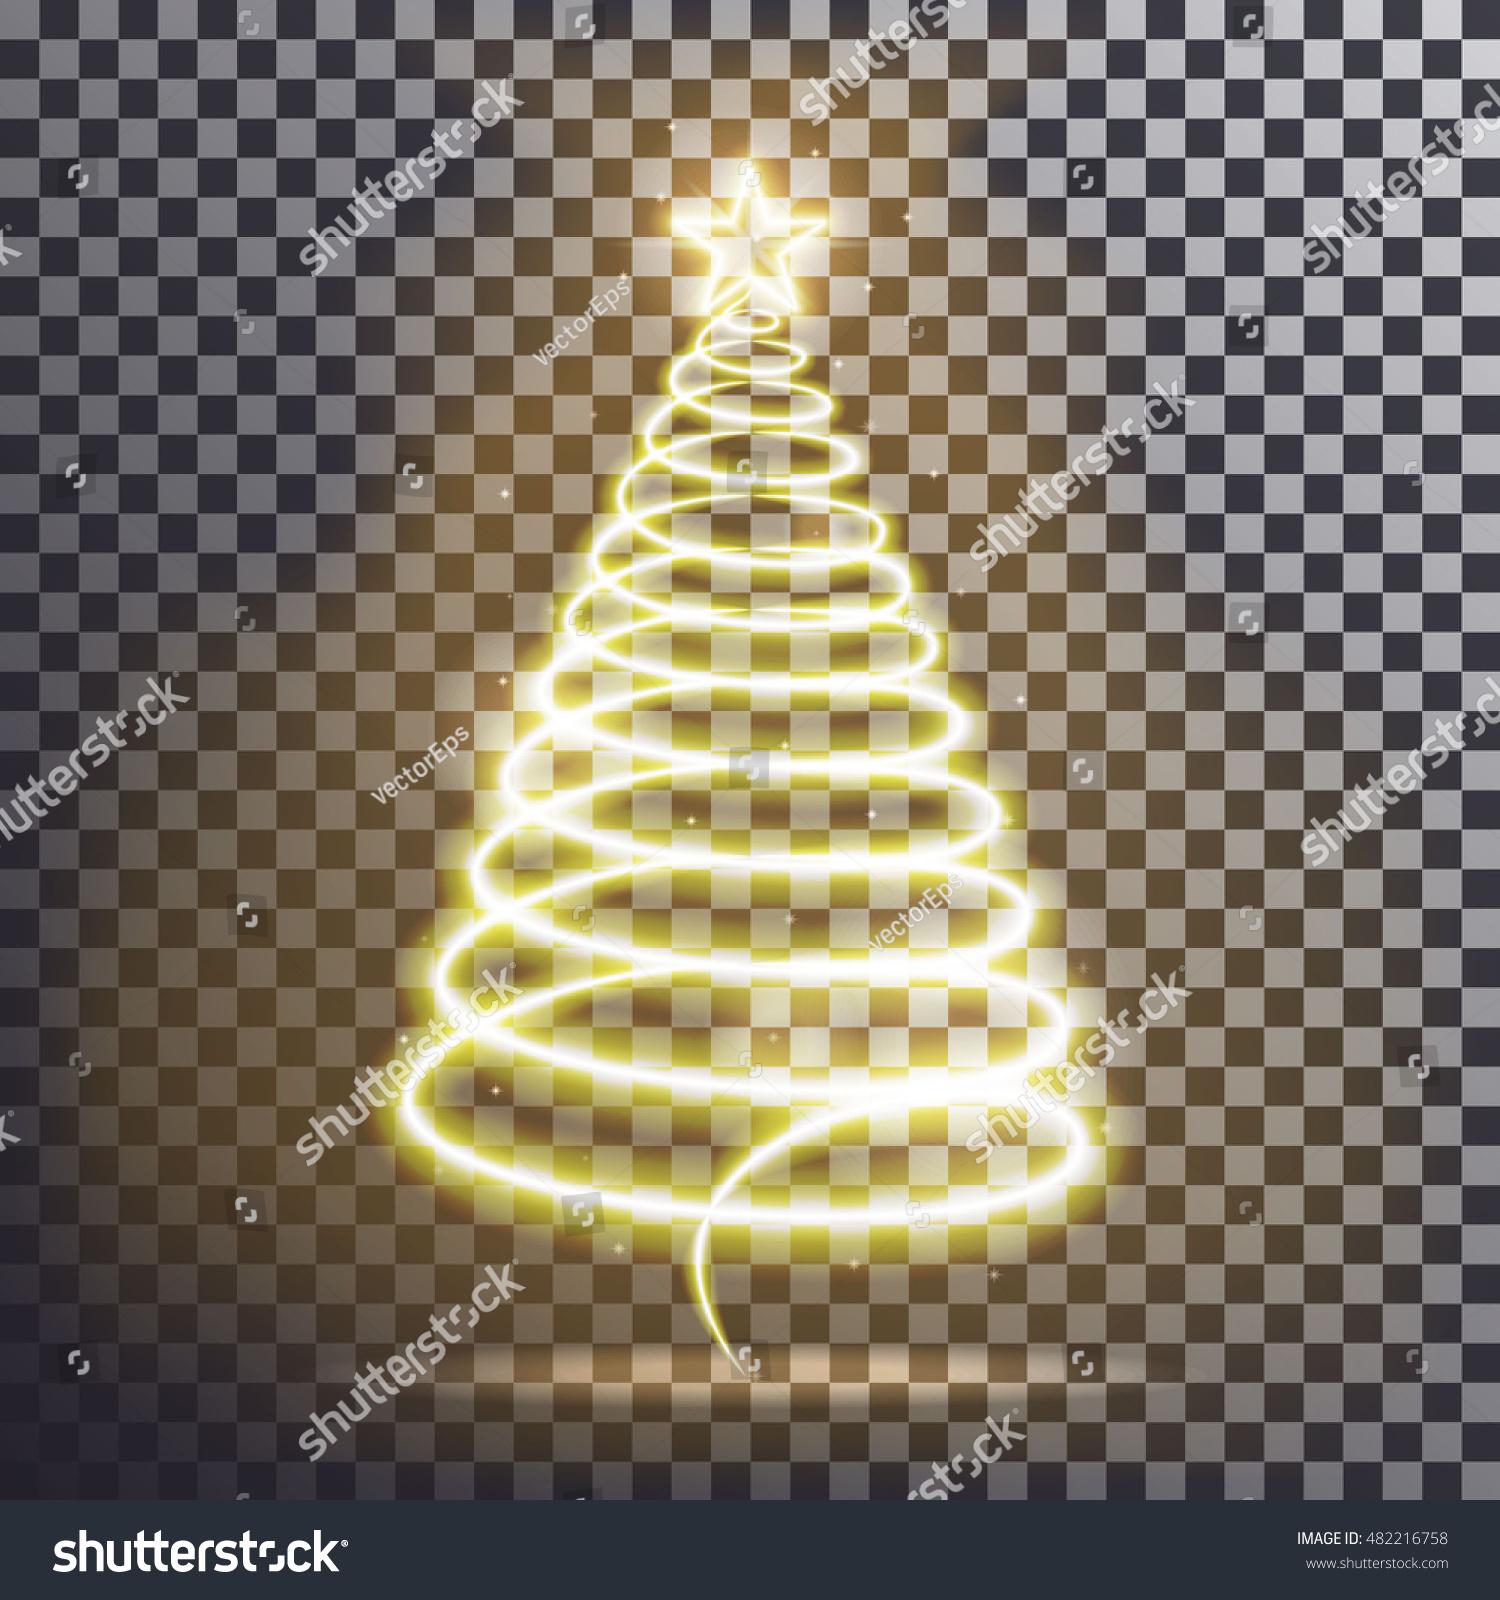 Golden Christmas Tree Vector Light Effect Stock Vector Royalty Free